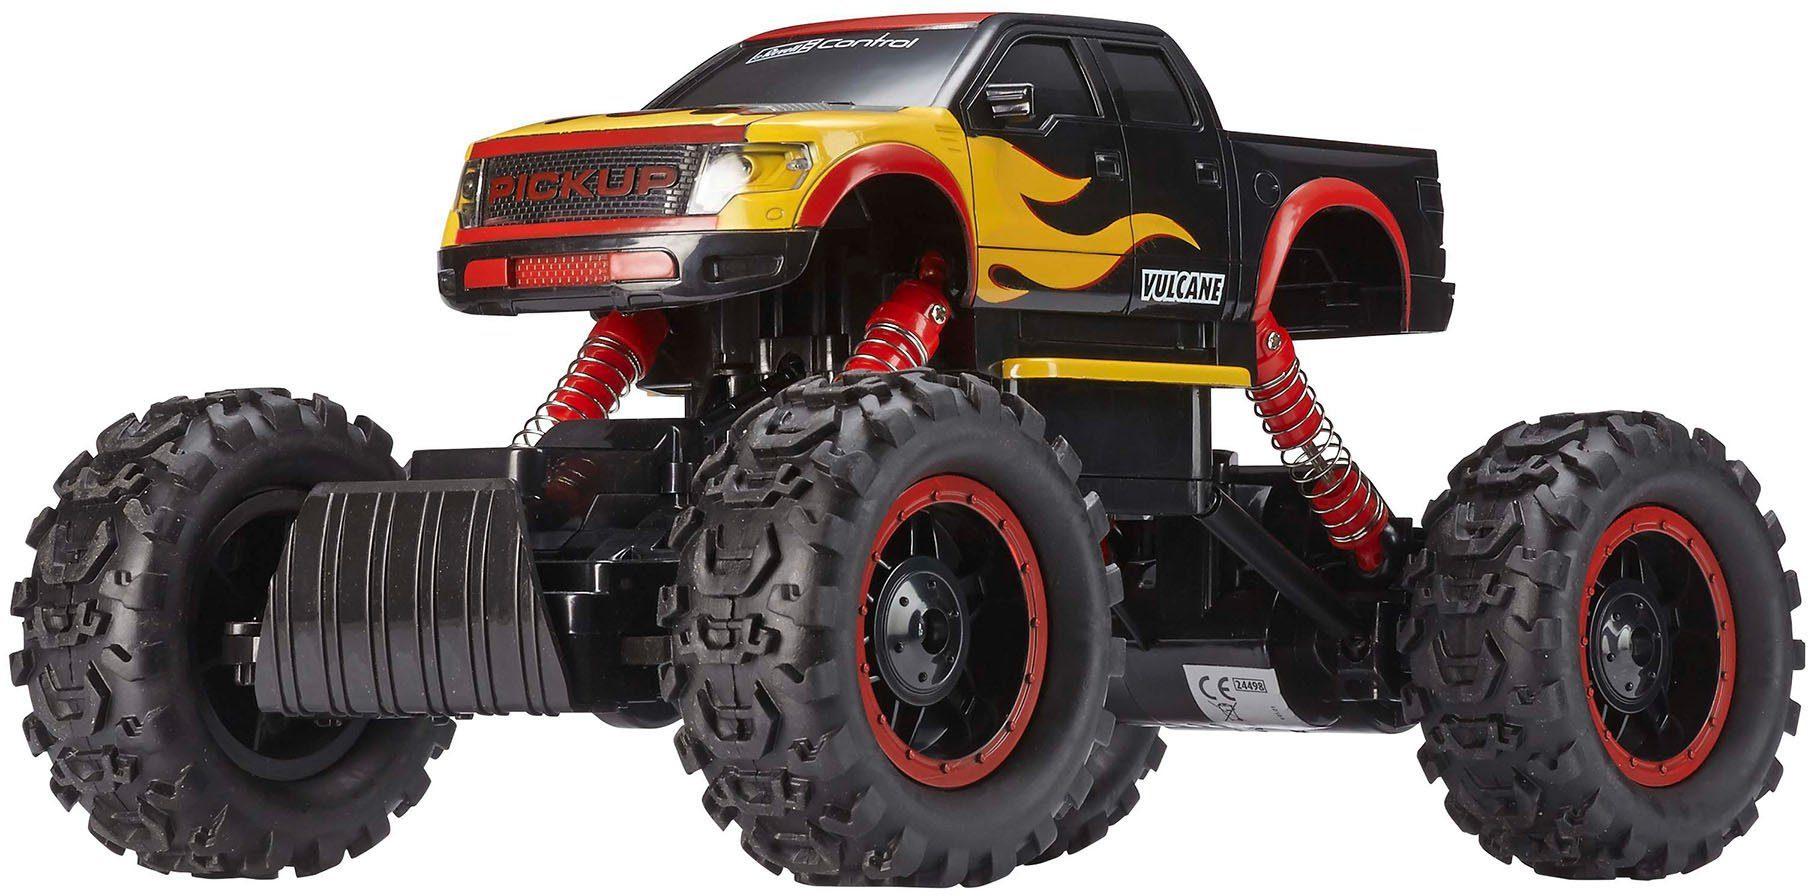 Revell® Control, RC Pickup mit Licht, »Crawler Vulcane«